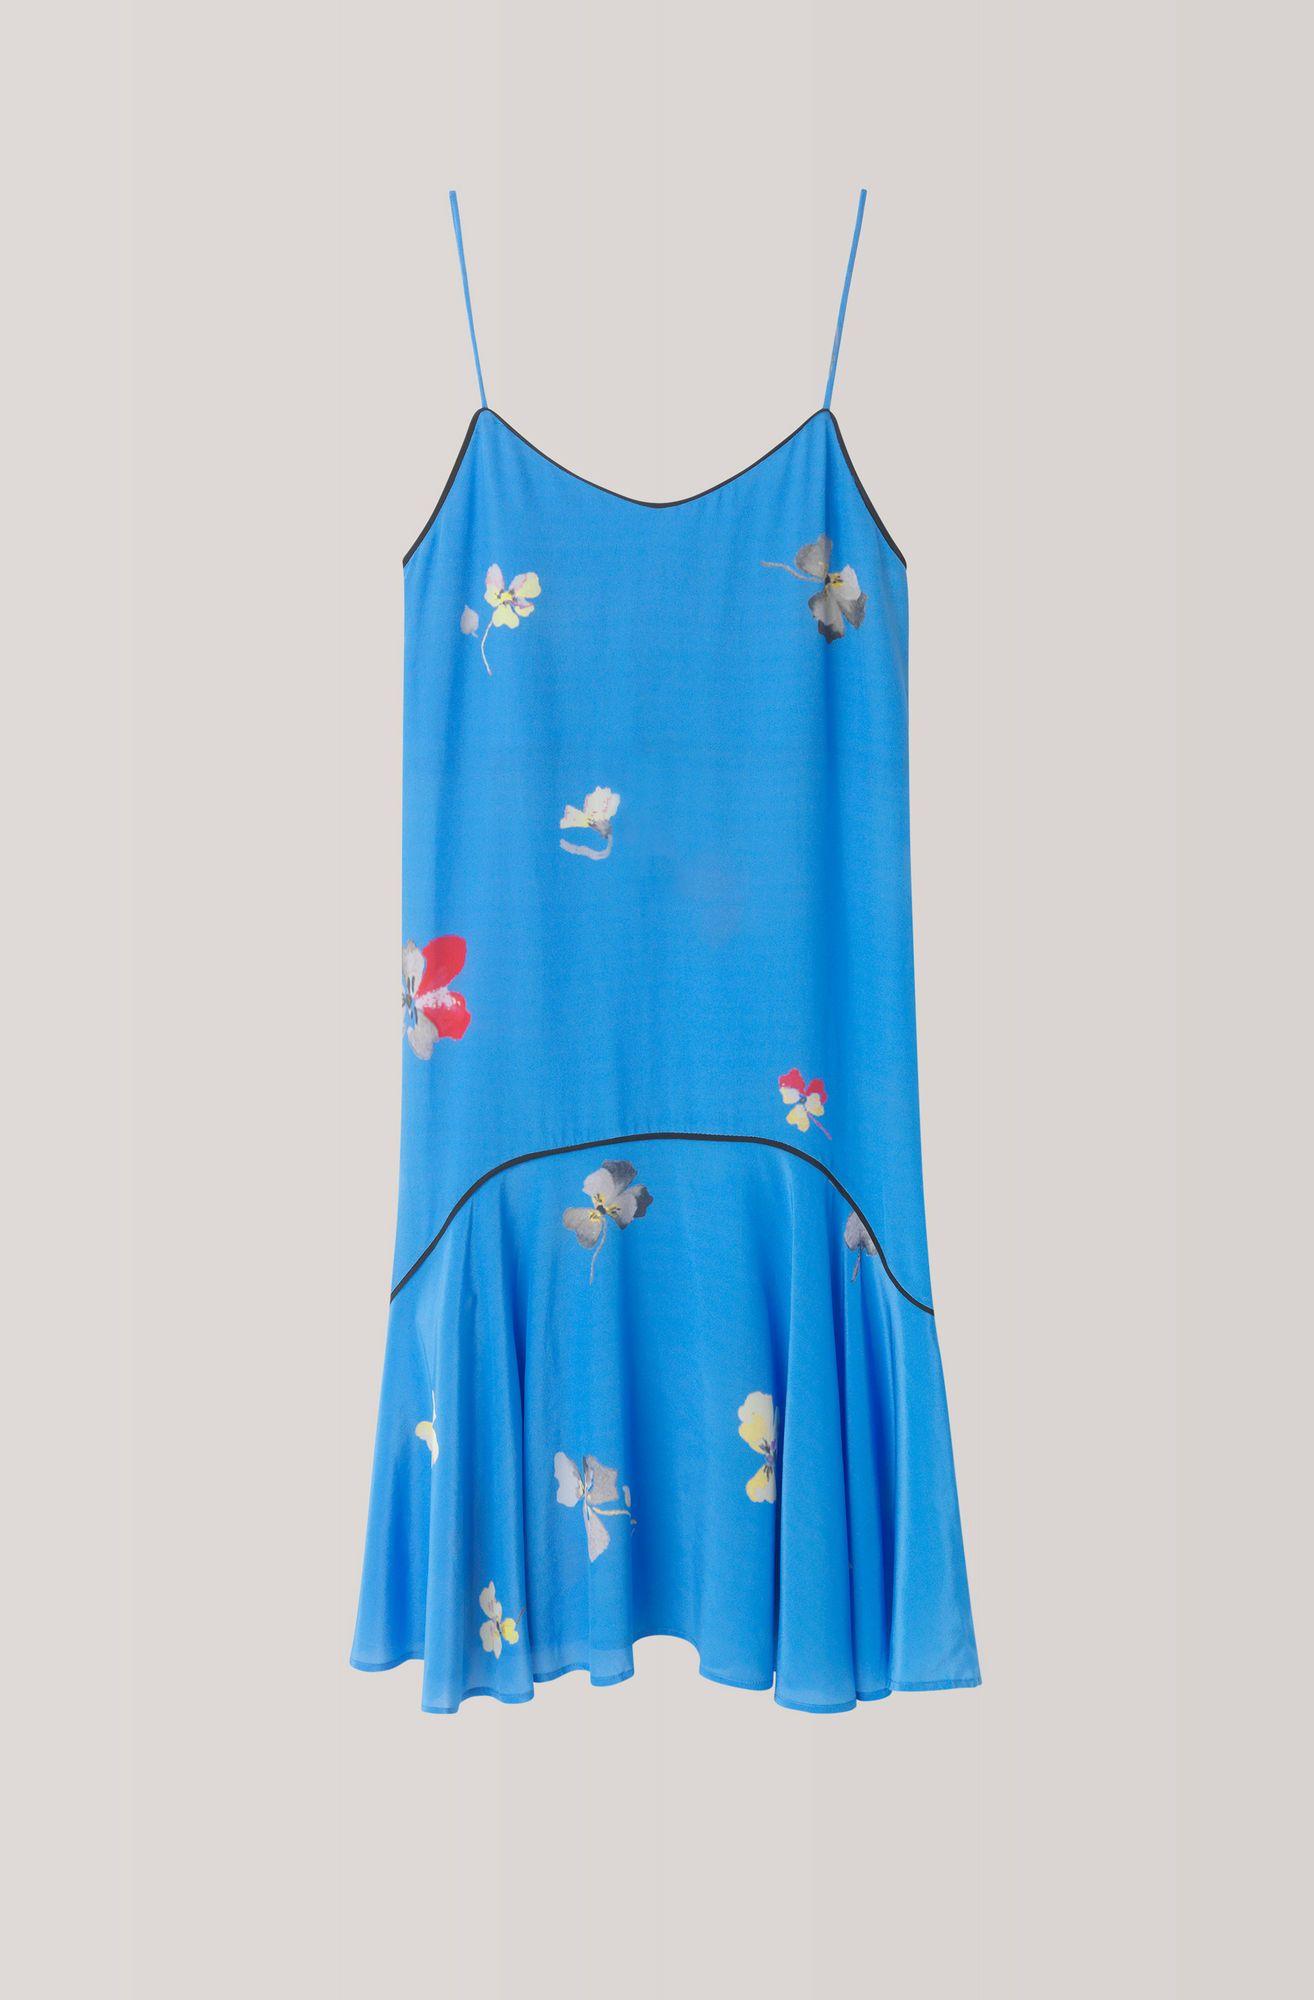 e08acce5575 Joycedale Strap Dress